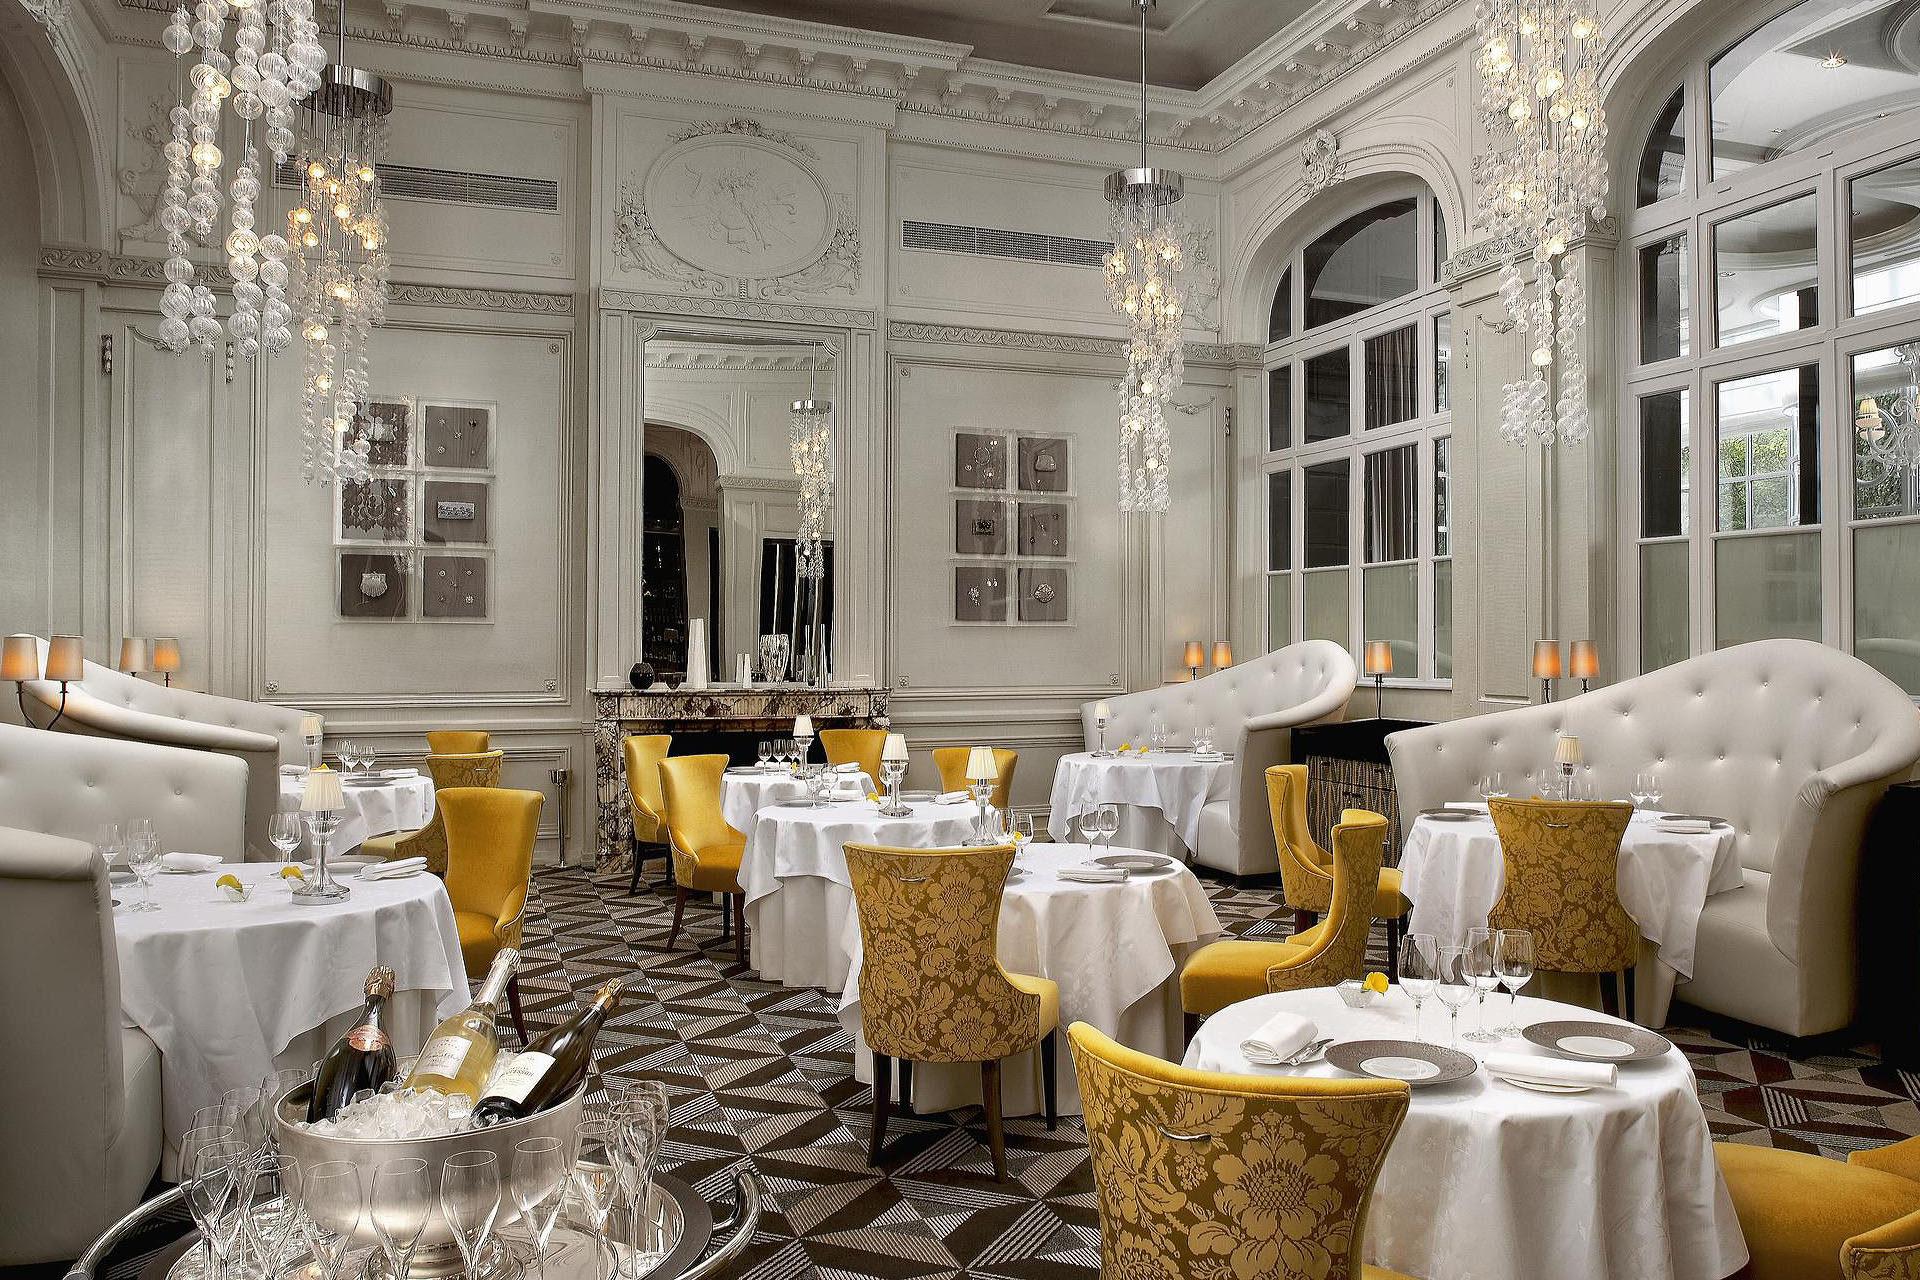 Restaurant decor - Marcotte Style